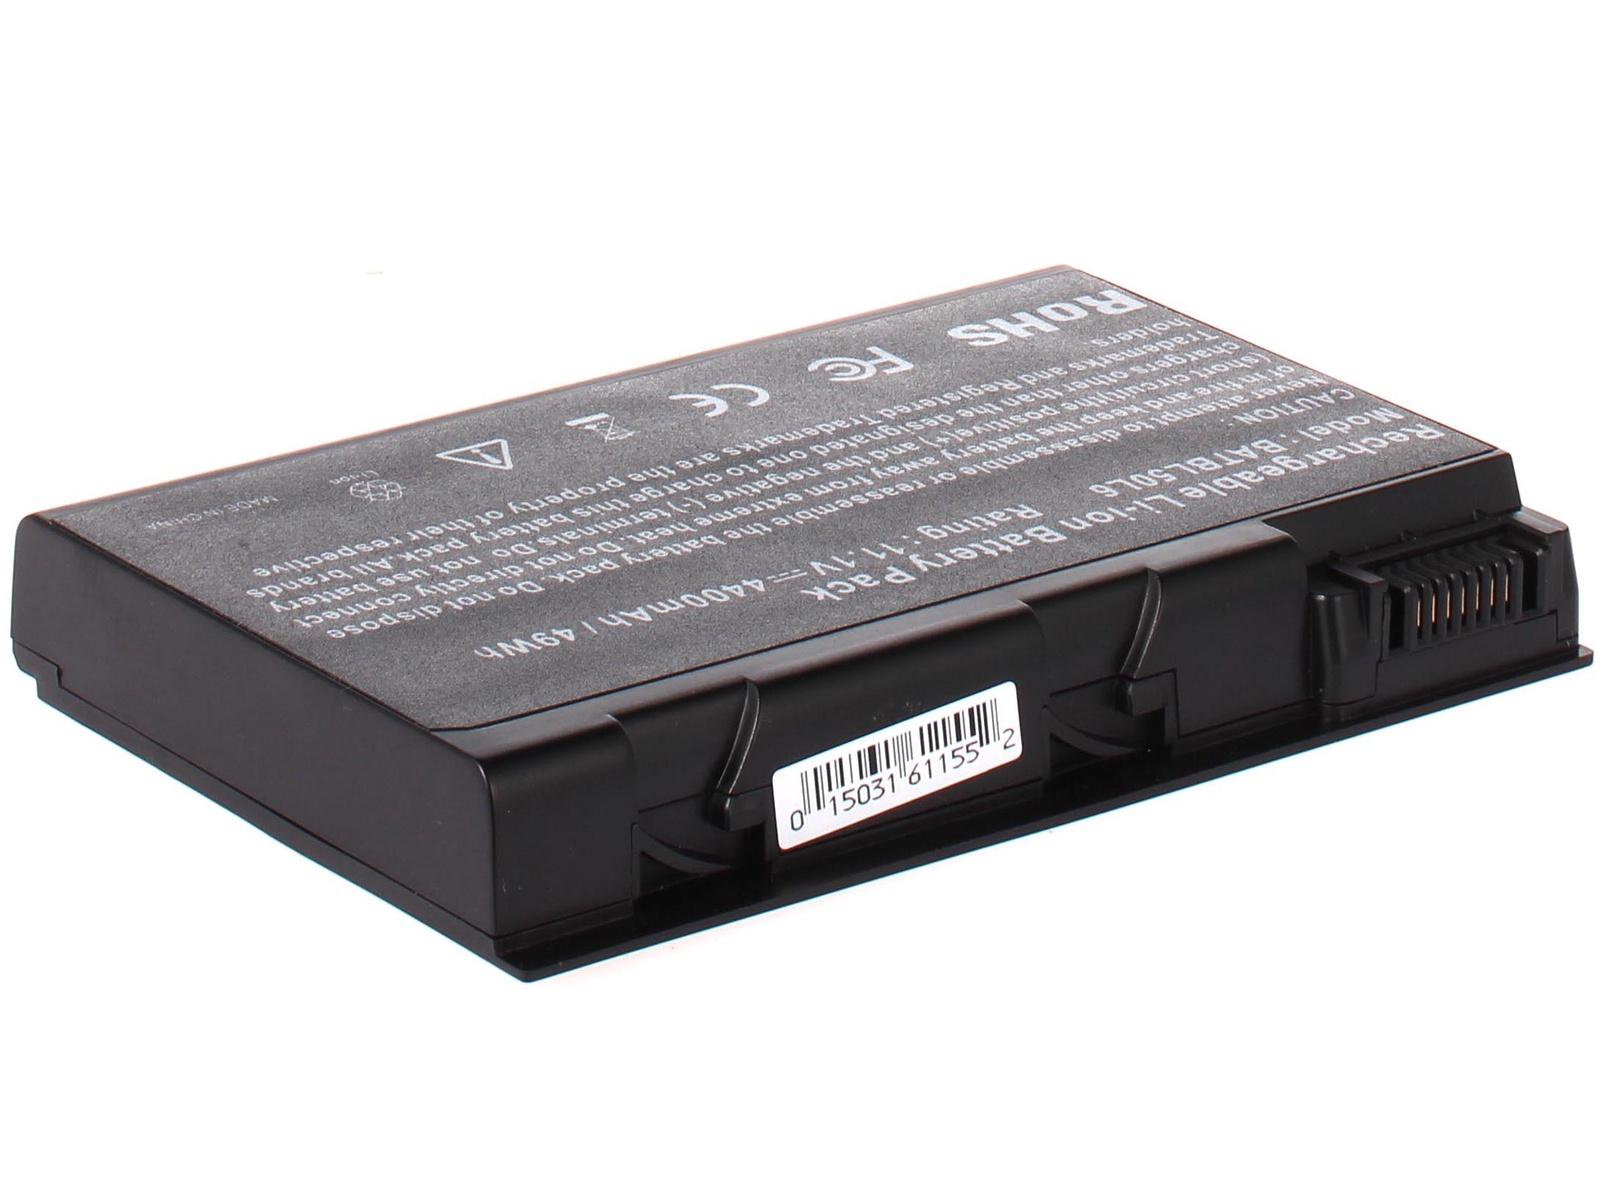 Аккумулятор для ноутбука AnyBatt для Acer Aspire 3692, Aspire 9802, Aspire 5611AWLMI, TravelMate 4233WLMi, Aspire 5103WLMI, TravelMate 5510, TravelMate 4202WLMi, Aspire 5102AWLMi, Aspire 5610Z, Aspire 5112, Aspire 9802WKMi acer aspire switch 10